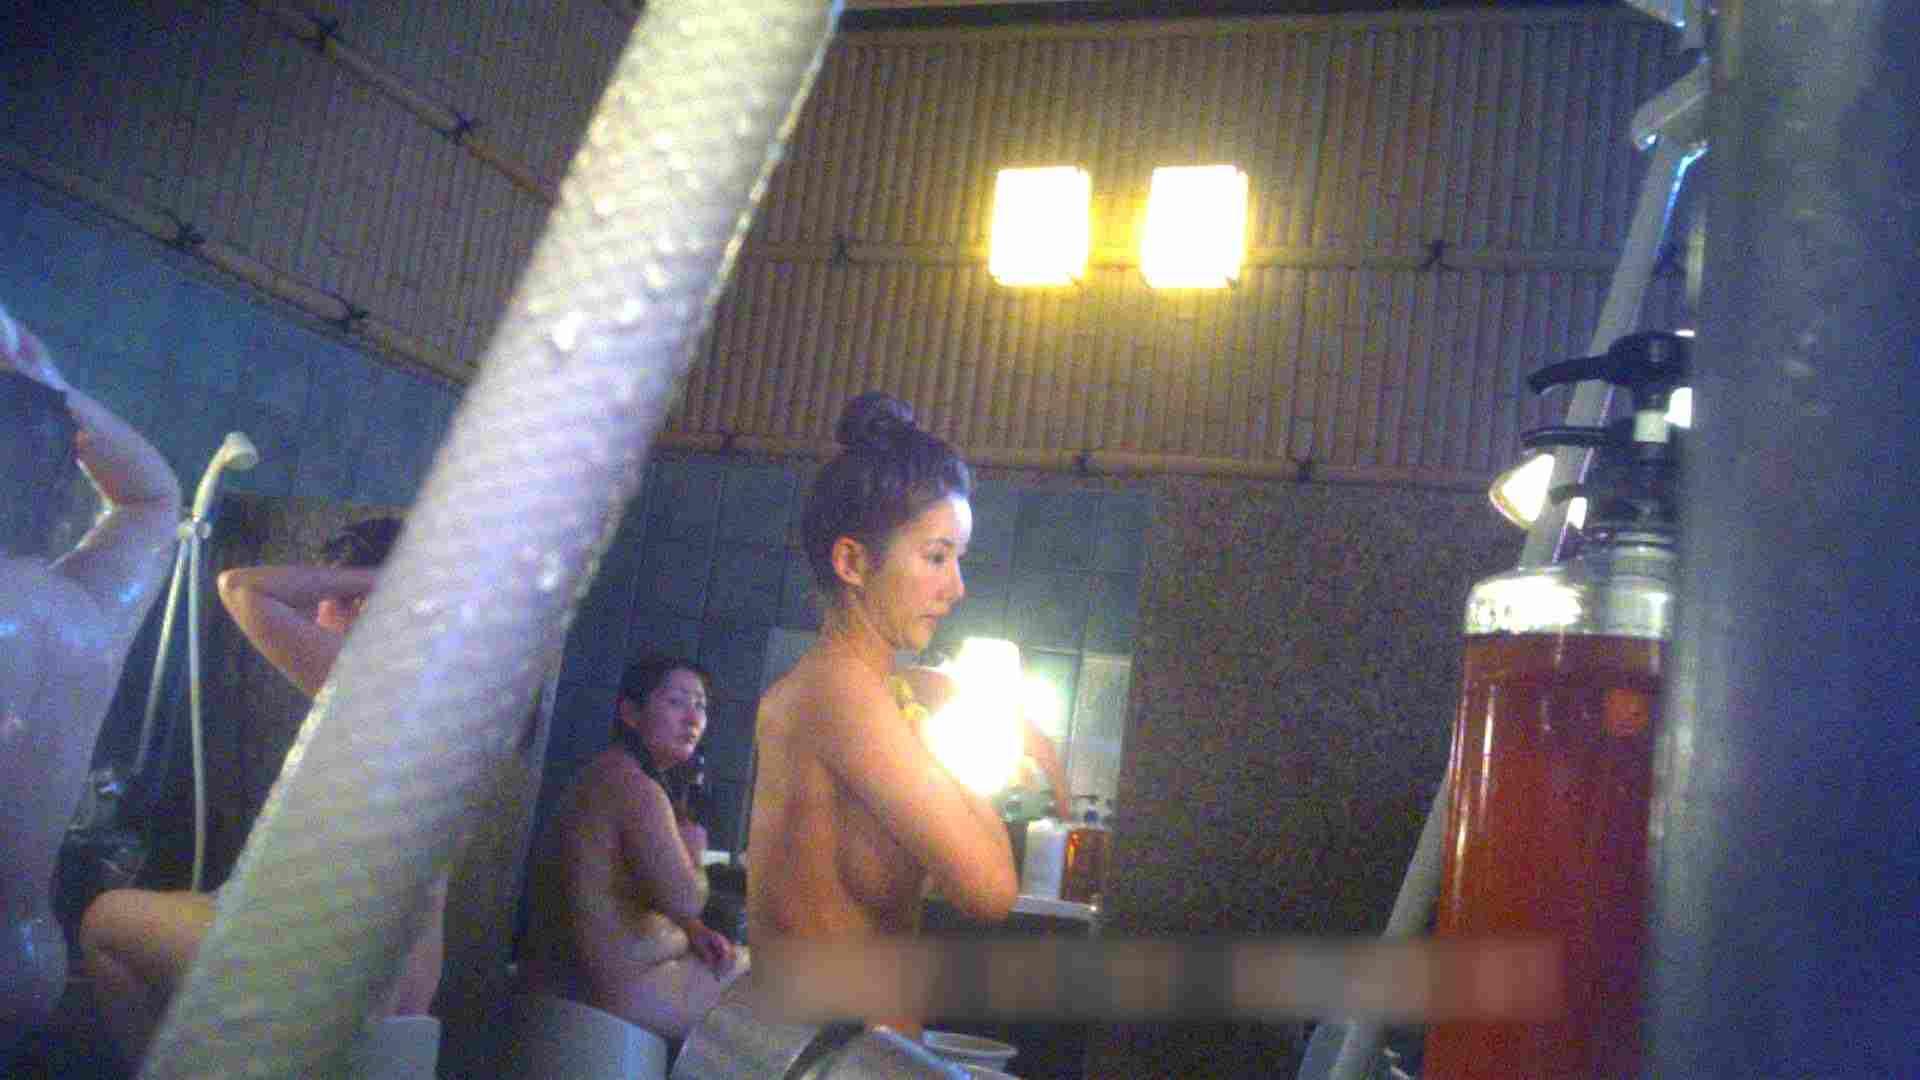 TG.15 【上等兵】高級旅館の爆乳女将で有名っぽい 潜入 おまんこ動画流出 110枚 2